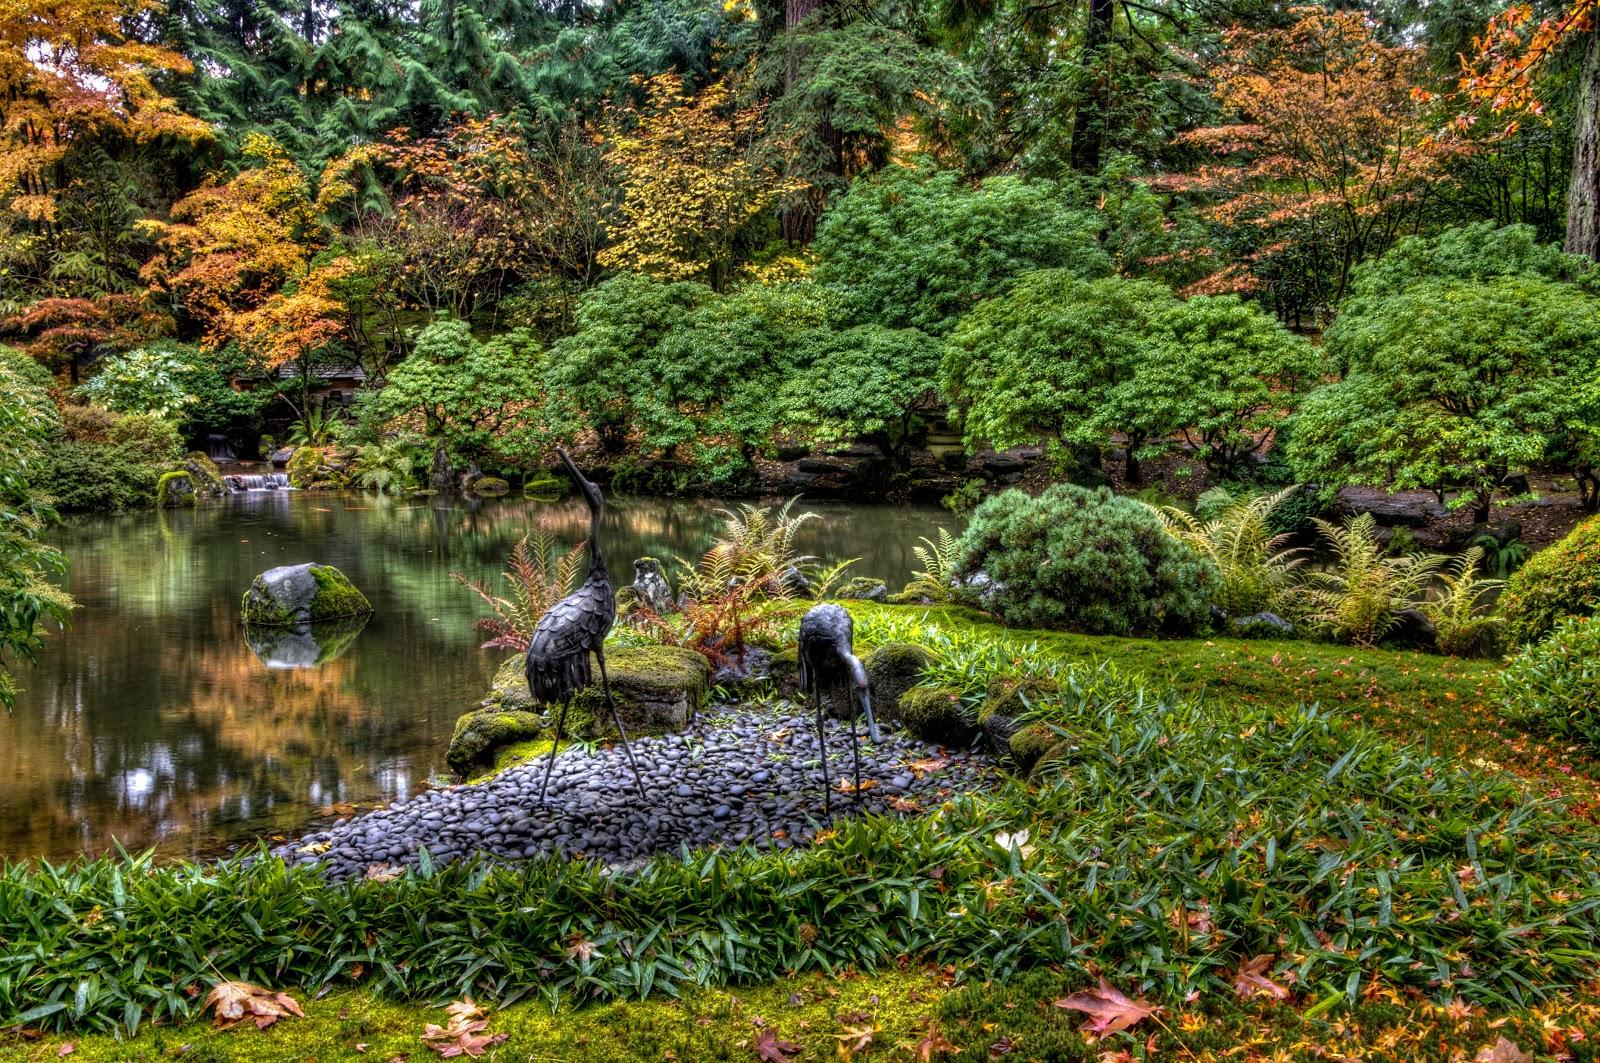 Thom zehrfeld photography japanese gardens portland for Japanese garden